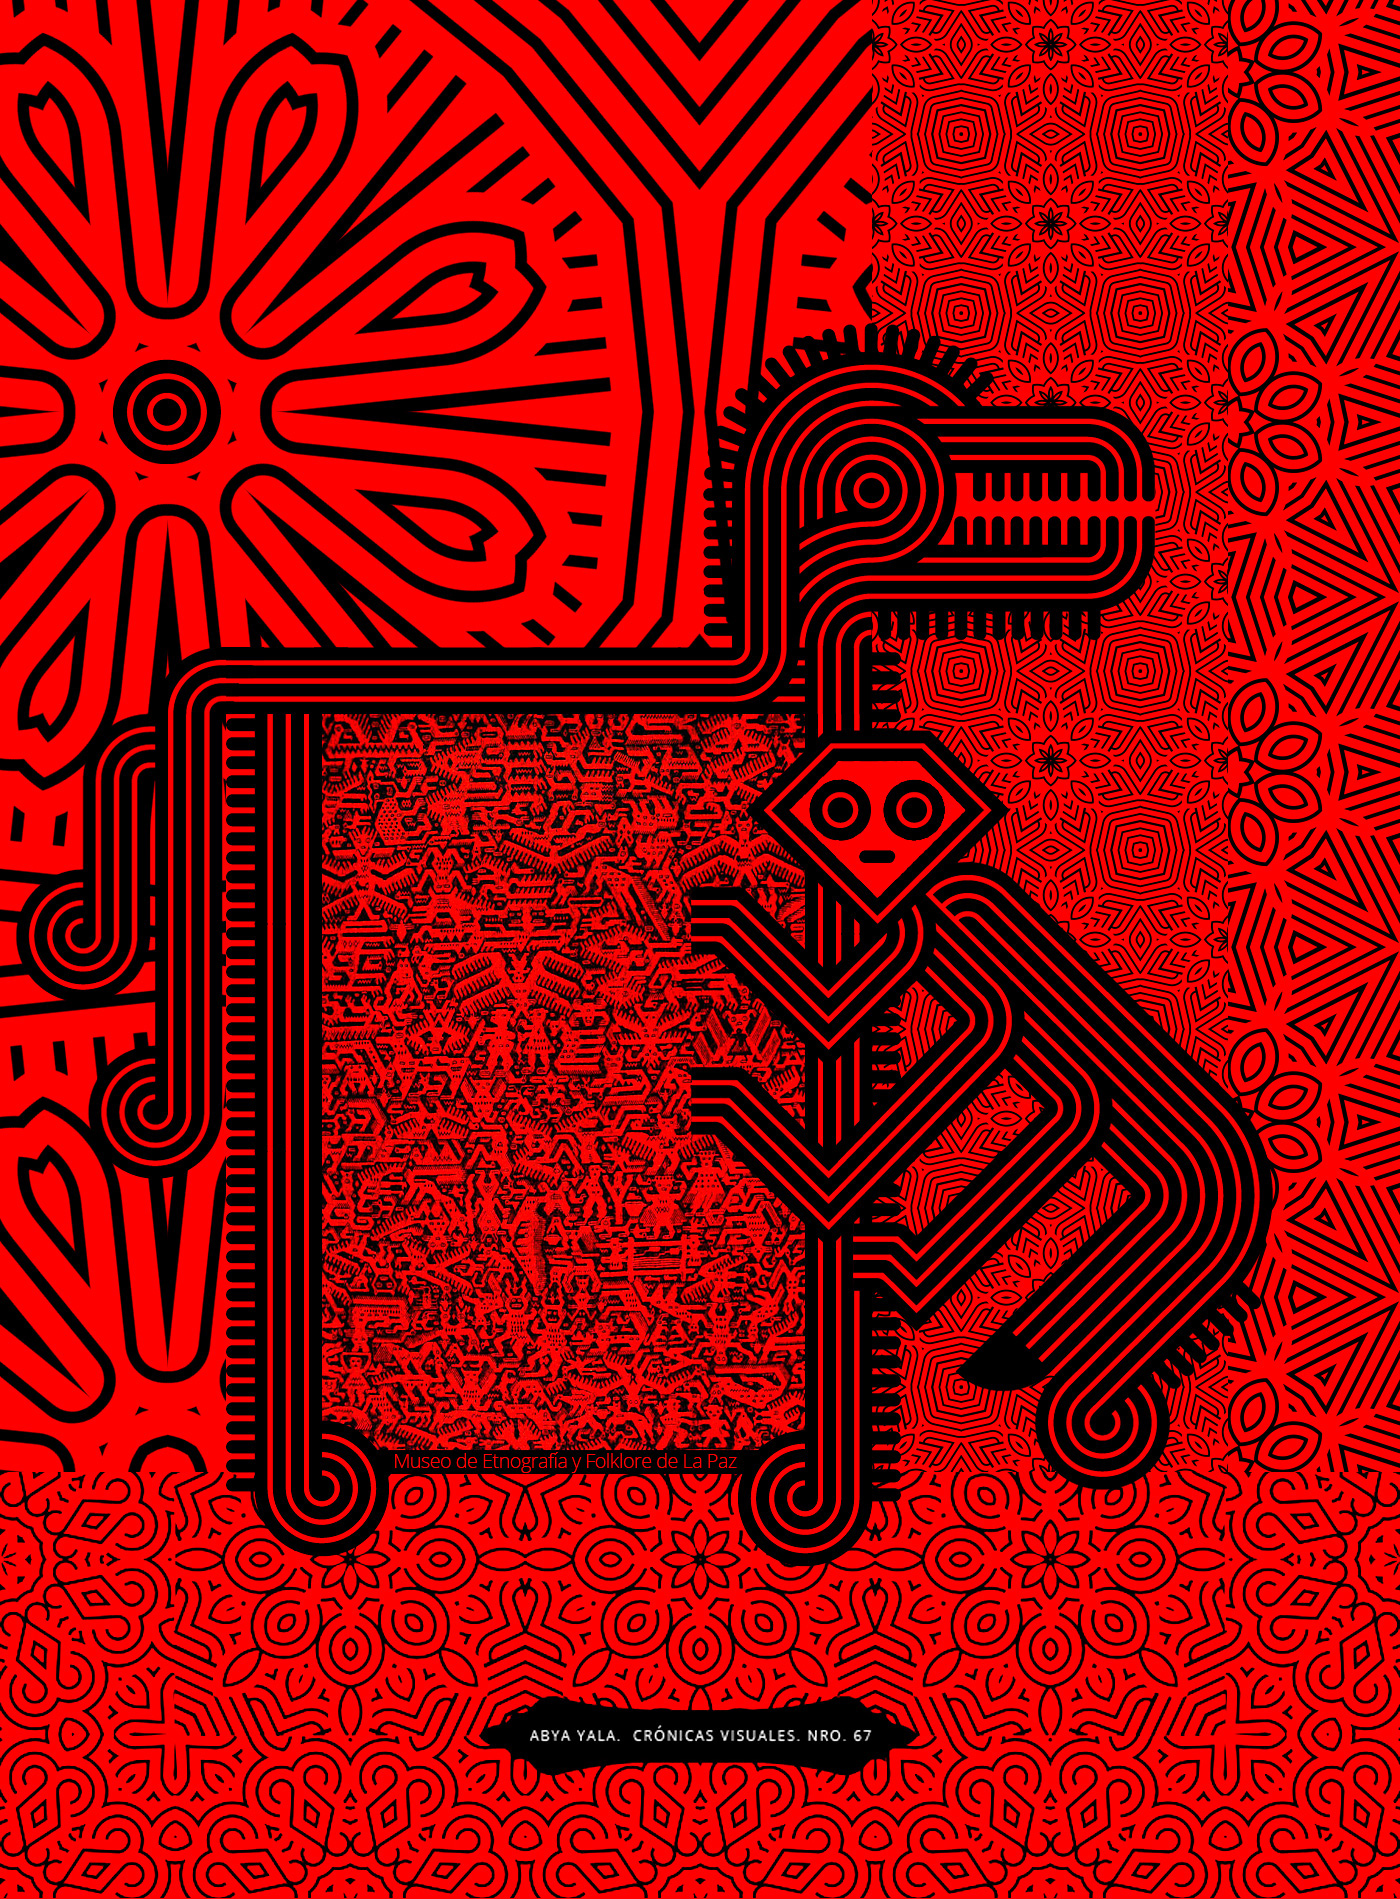 bolivia Amuki Abya Yala letras ilustradas Patrones Khurus Jalq'a